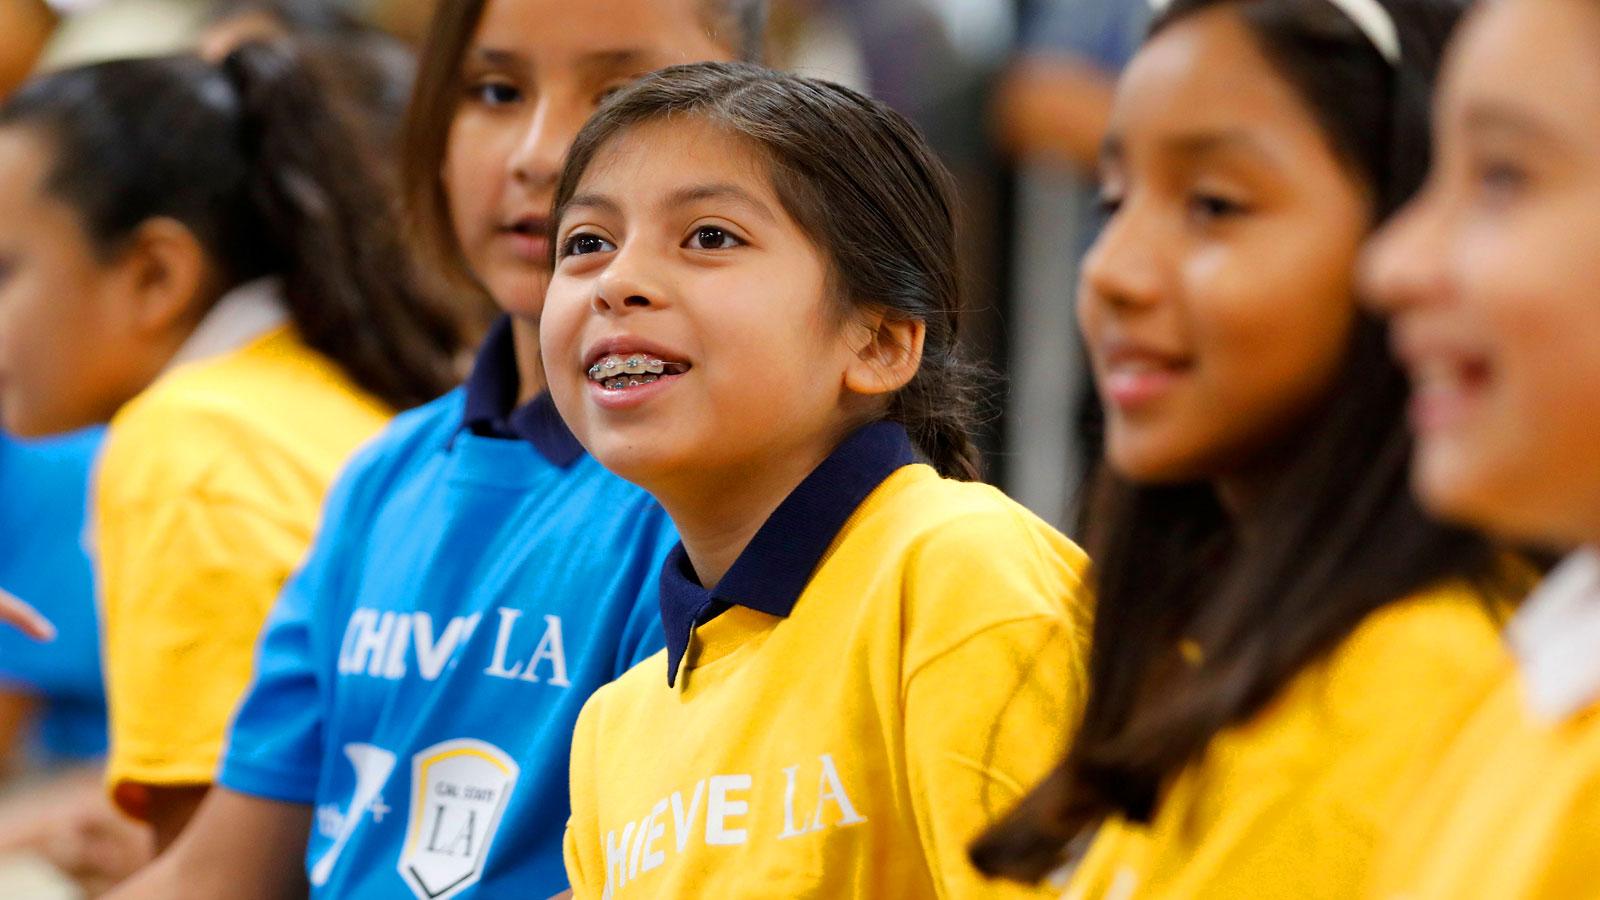 Students listen as Mayor Eric Garcetti announces Achieve LA.